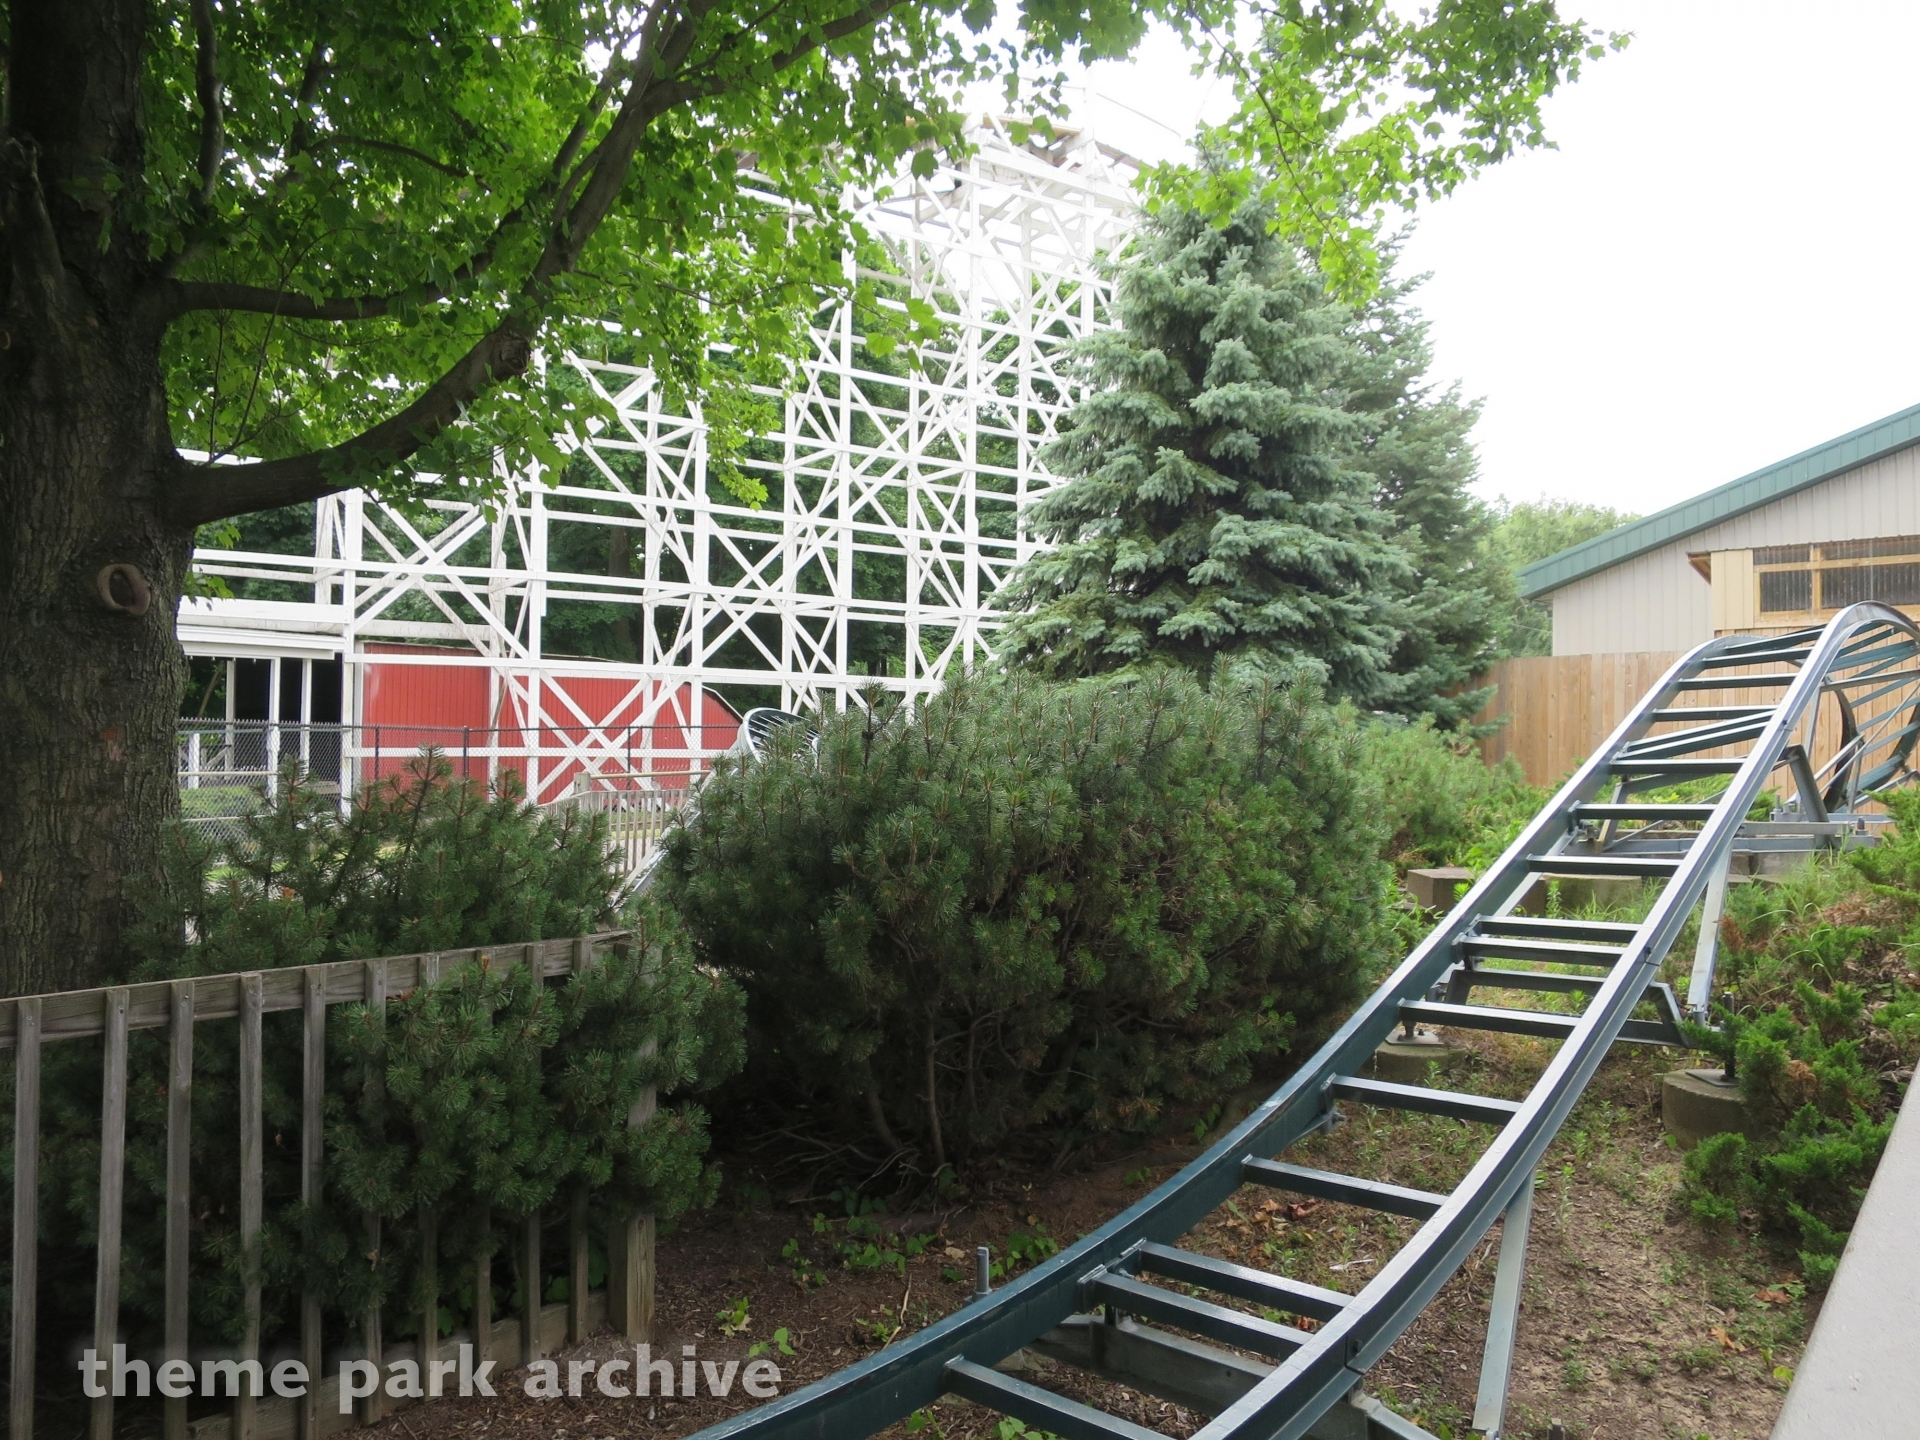 Bear Trax at Seabreeze Amusement Park